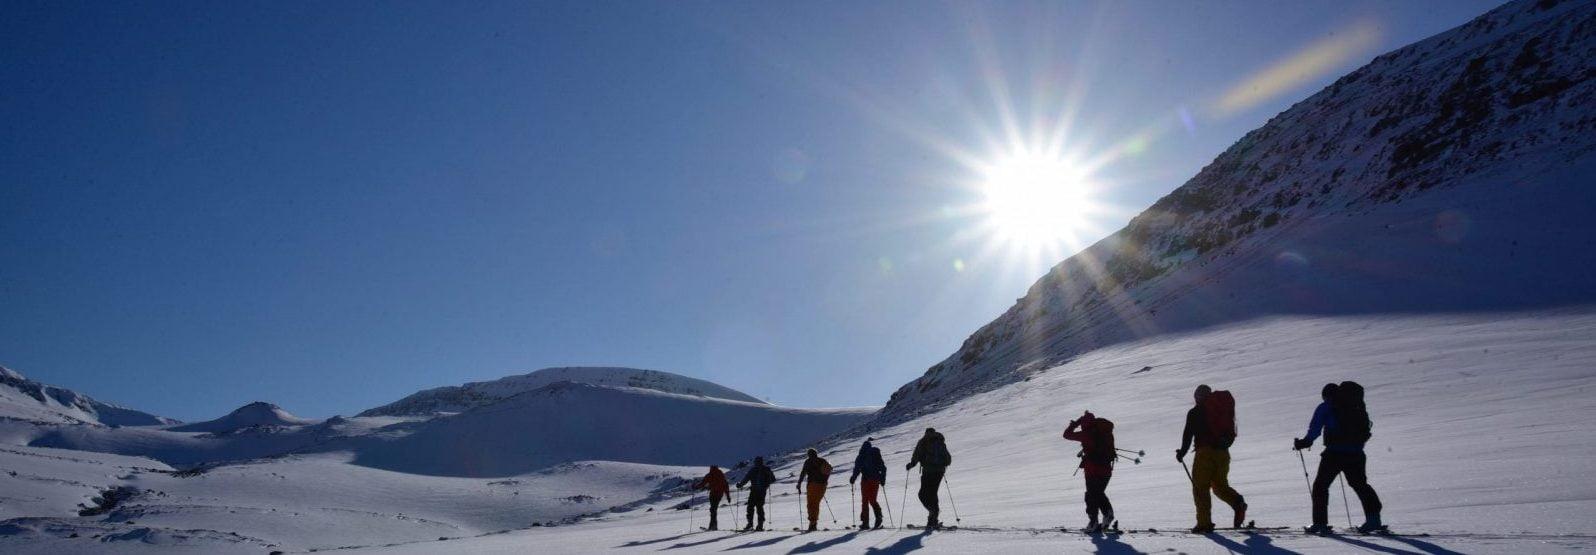 Iceland Backcountry ski